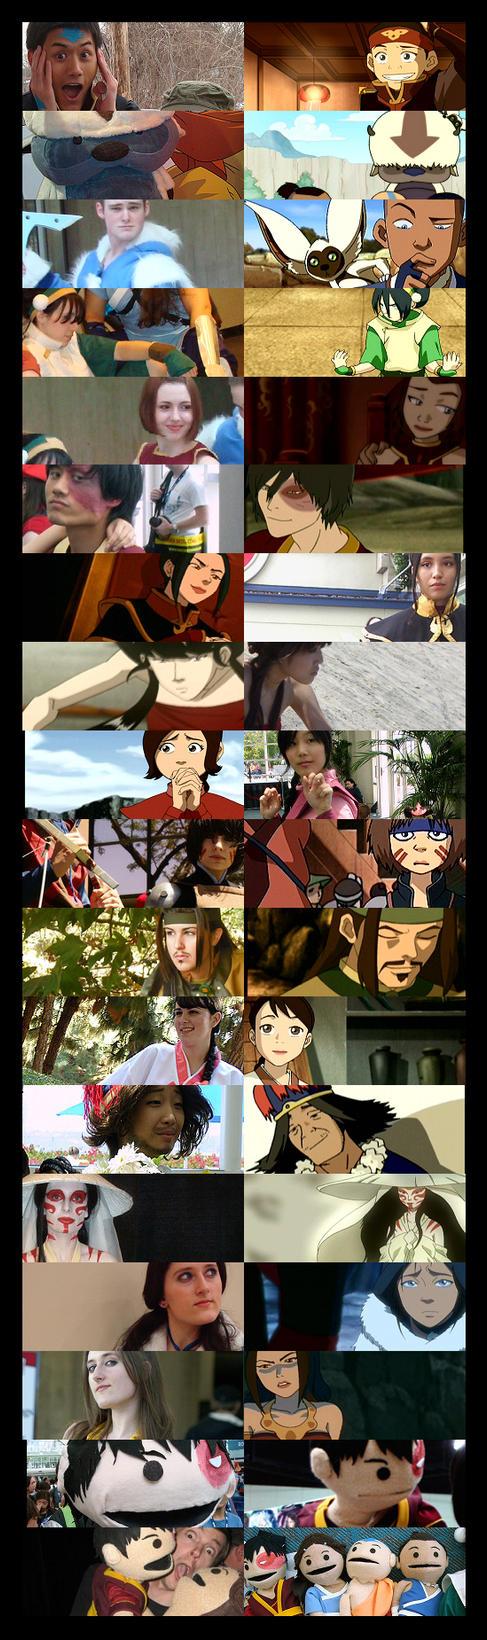 Avatar Crew: 07.2007 - 02.2009 by Avatar-Crew